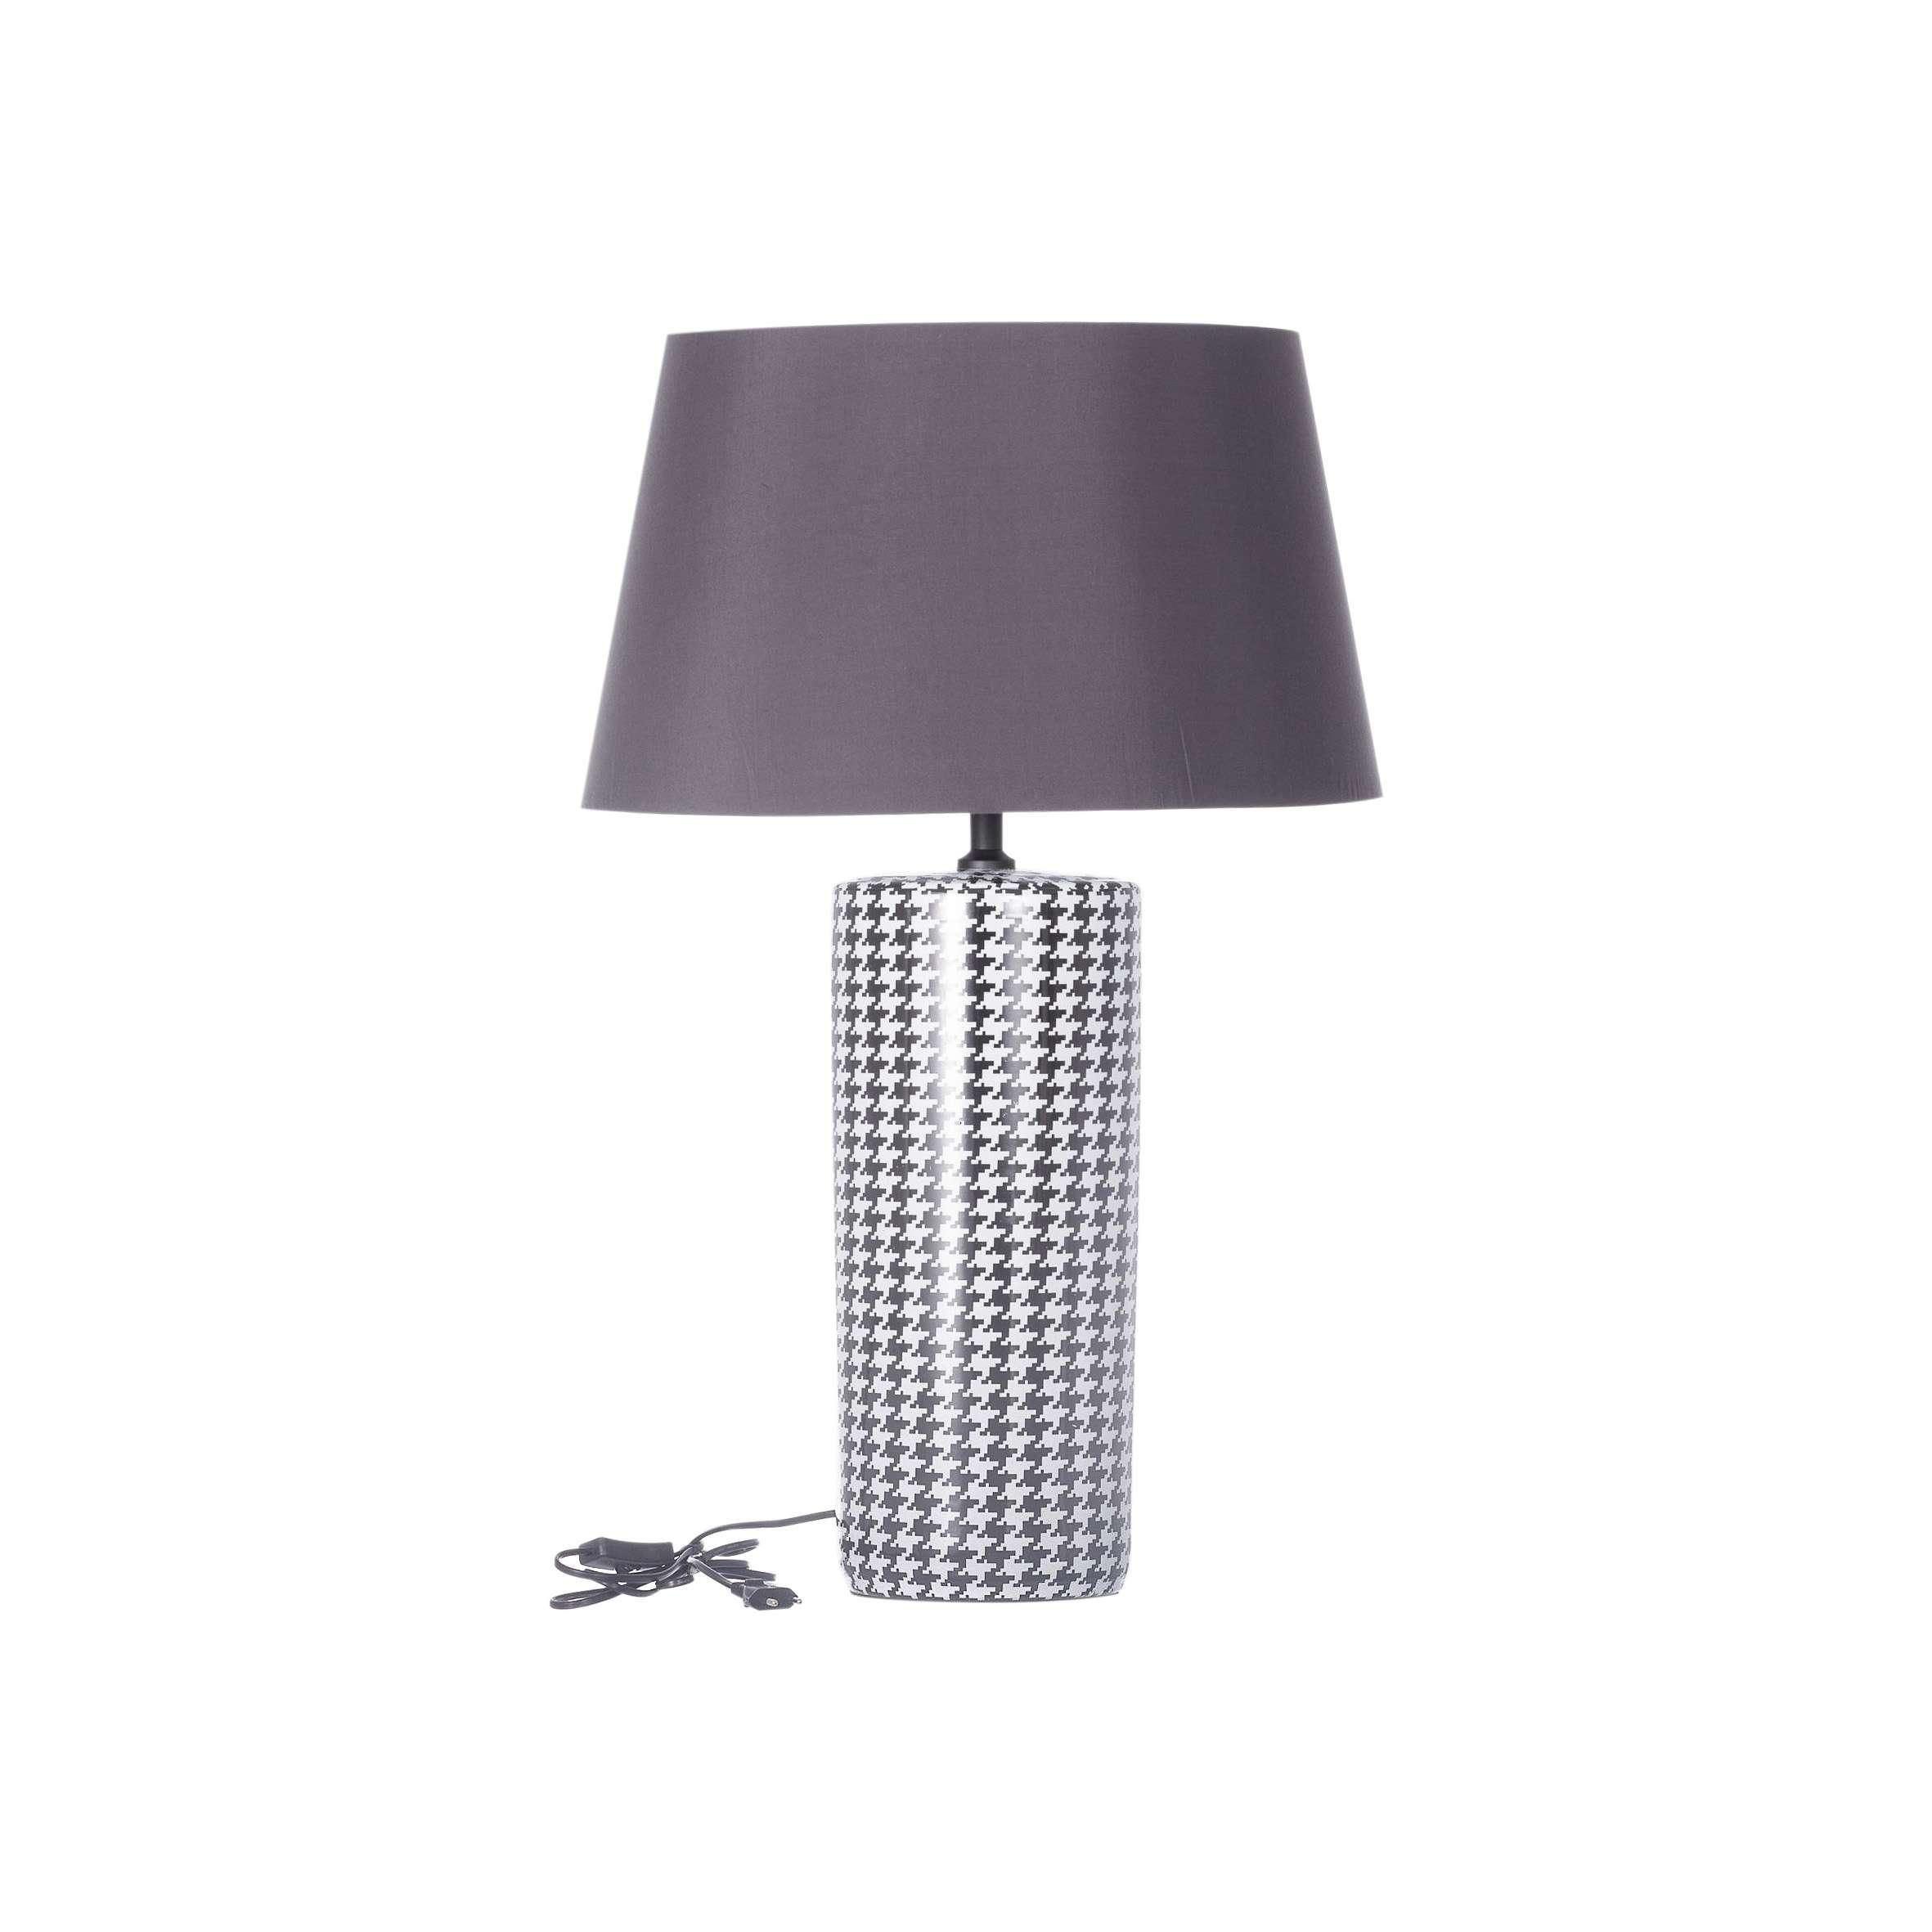 Tafellamp Chisato